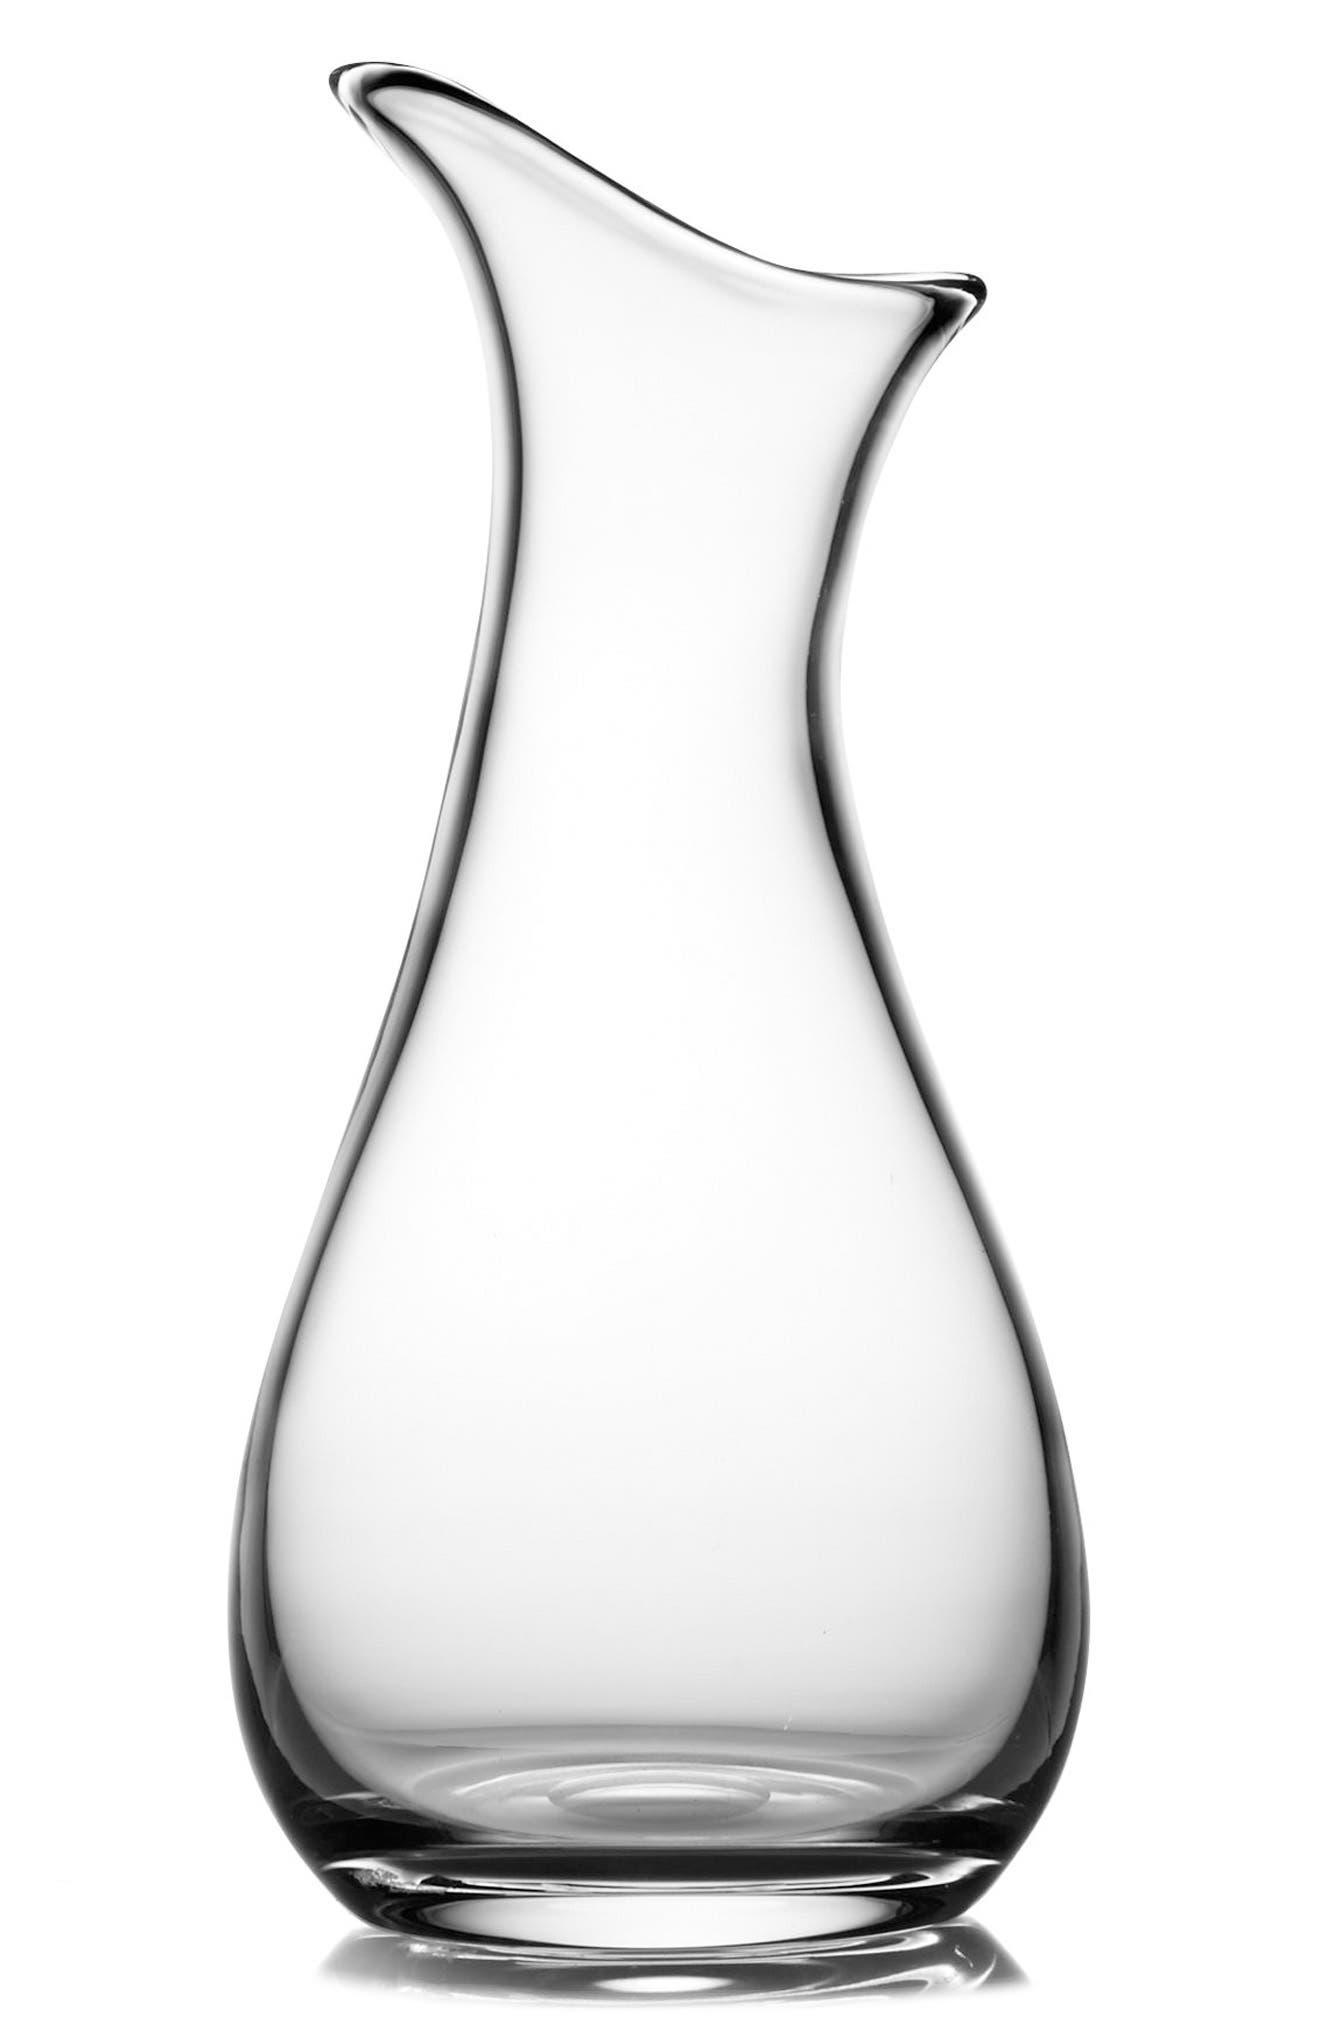 Main Image - Nambé Large Moderne Art Vase